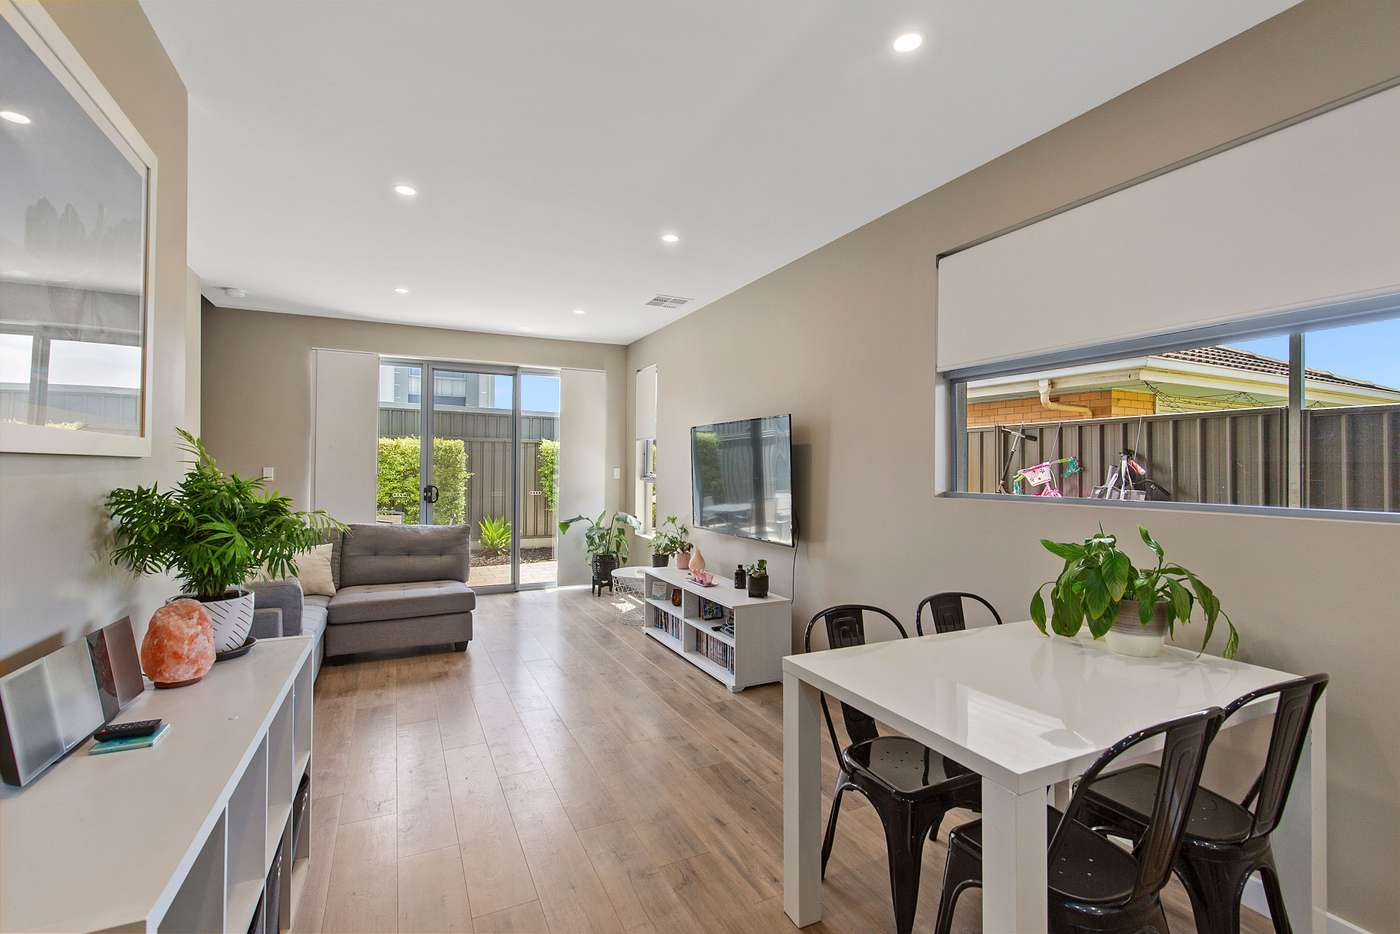 Fifth view of Homely house listing, 23B Grazing Avenue, Morphett Vale SA 5162